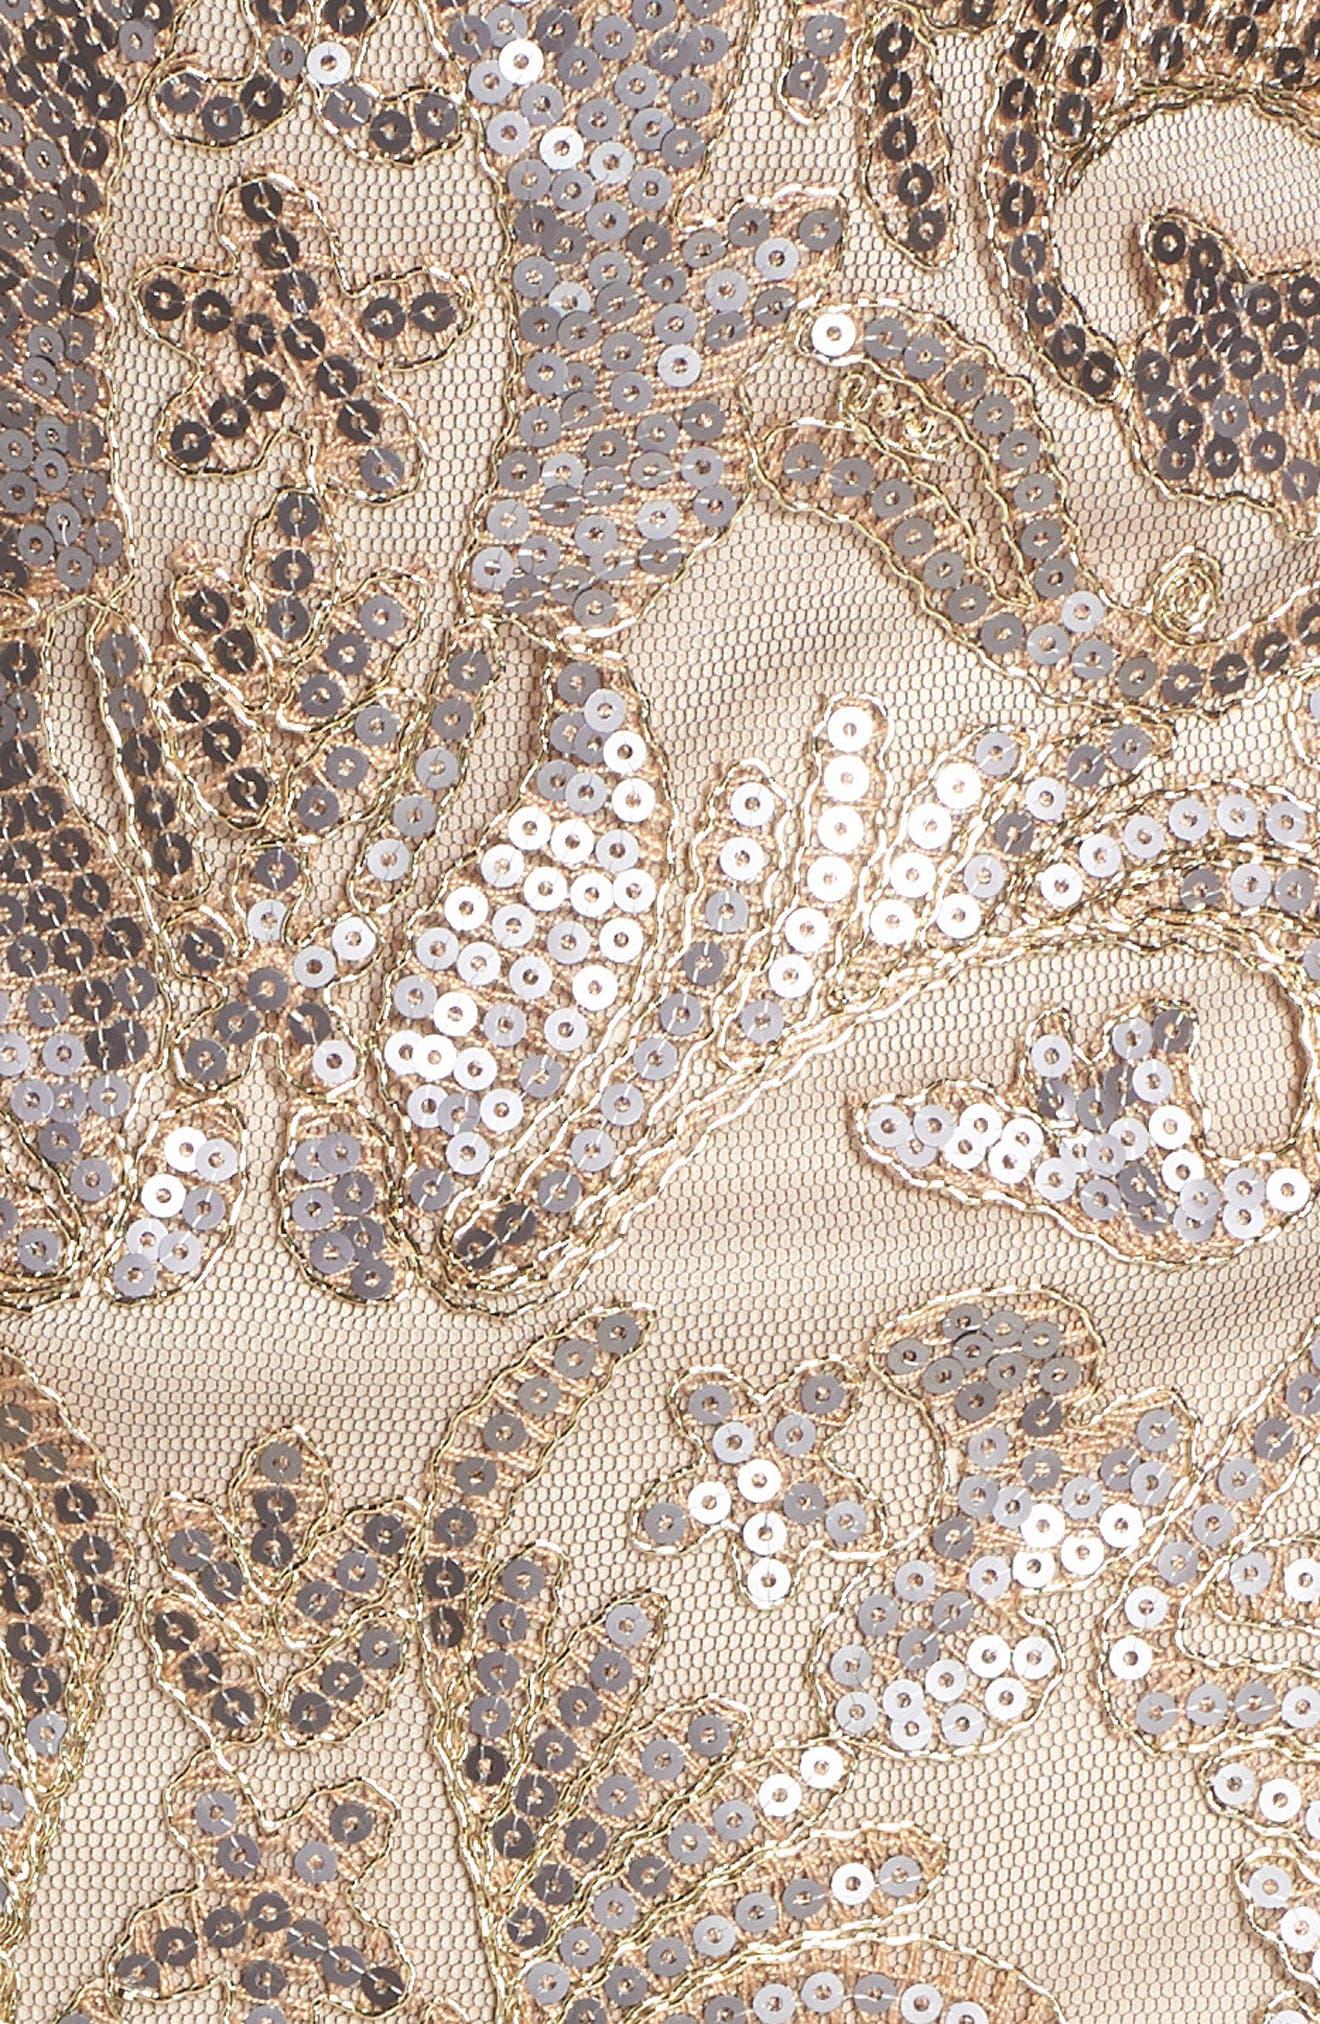 Sequin & Lace Sheath Dress,                             Alternate thumbnail 6, color,                             COPPER SHADOW